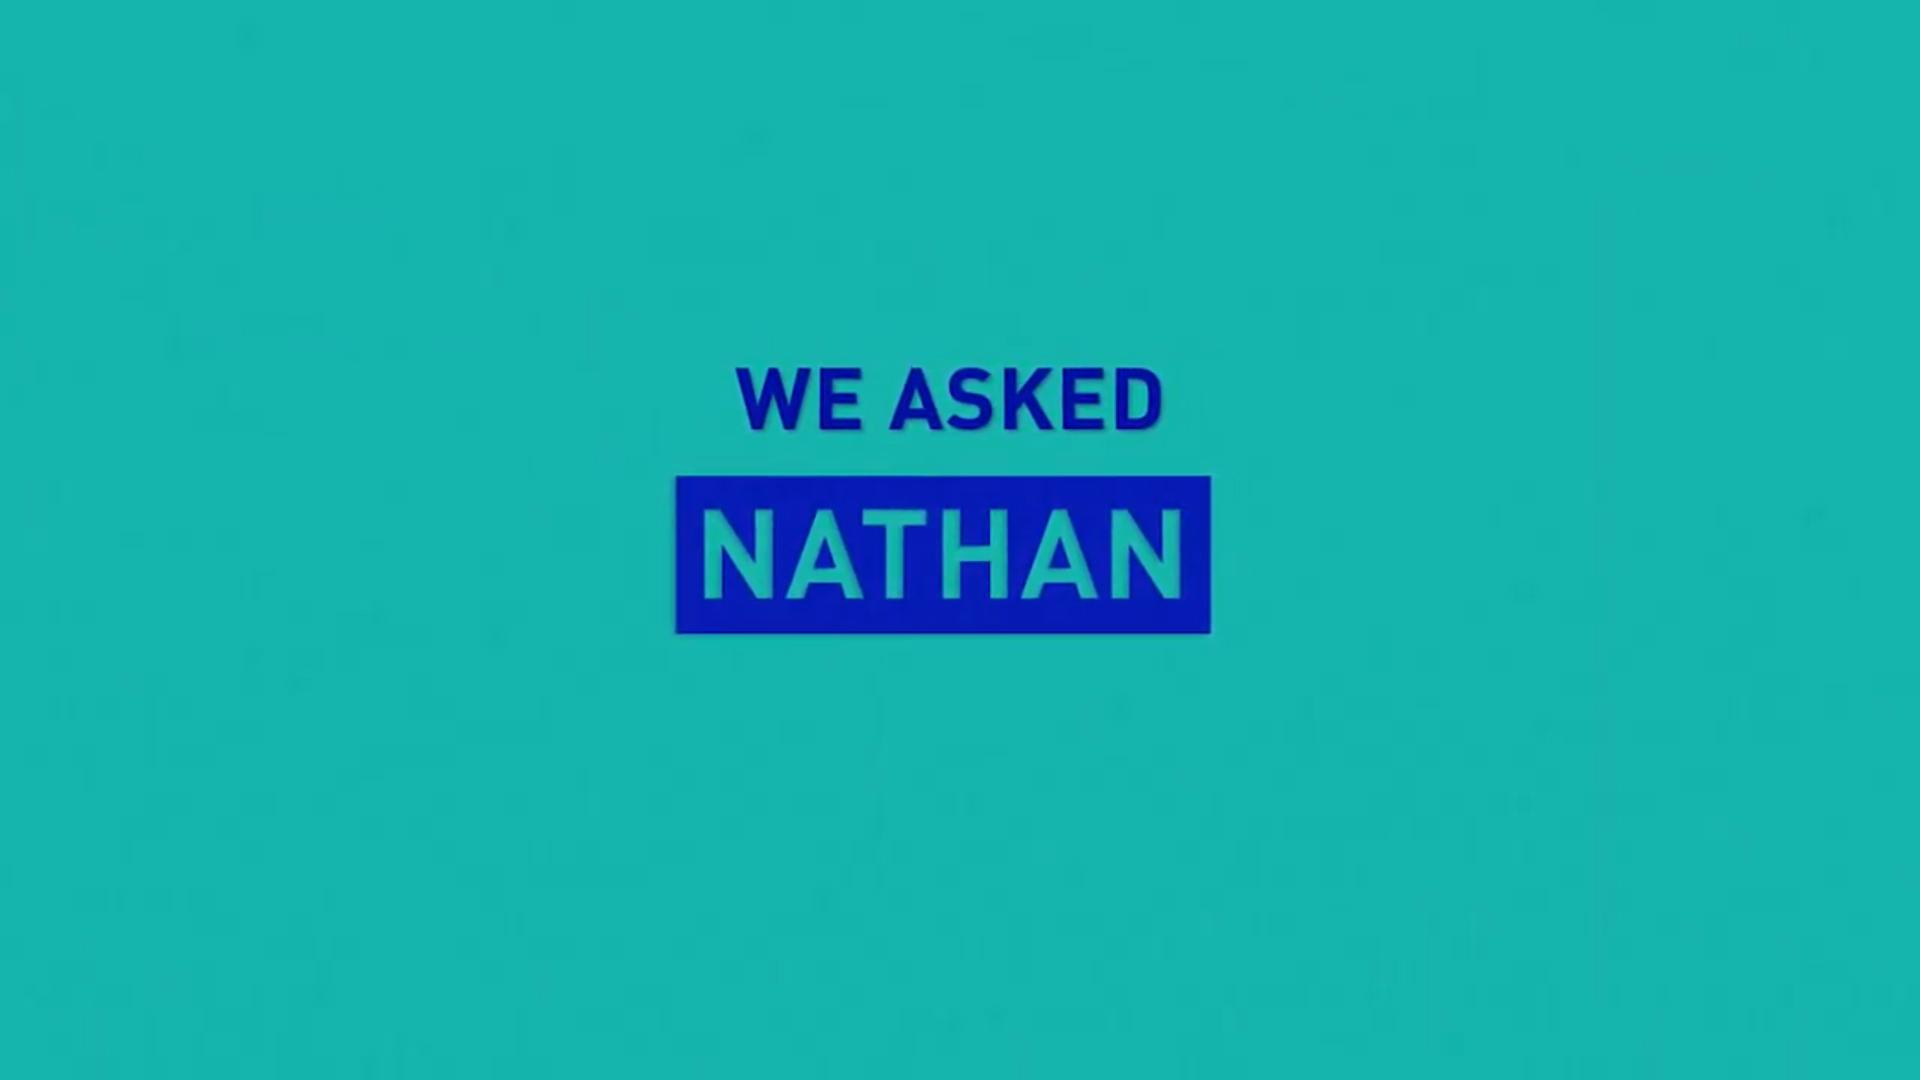 we asked nathan splash image